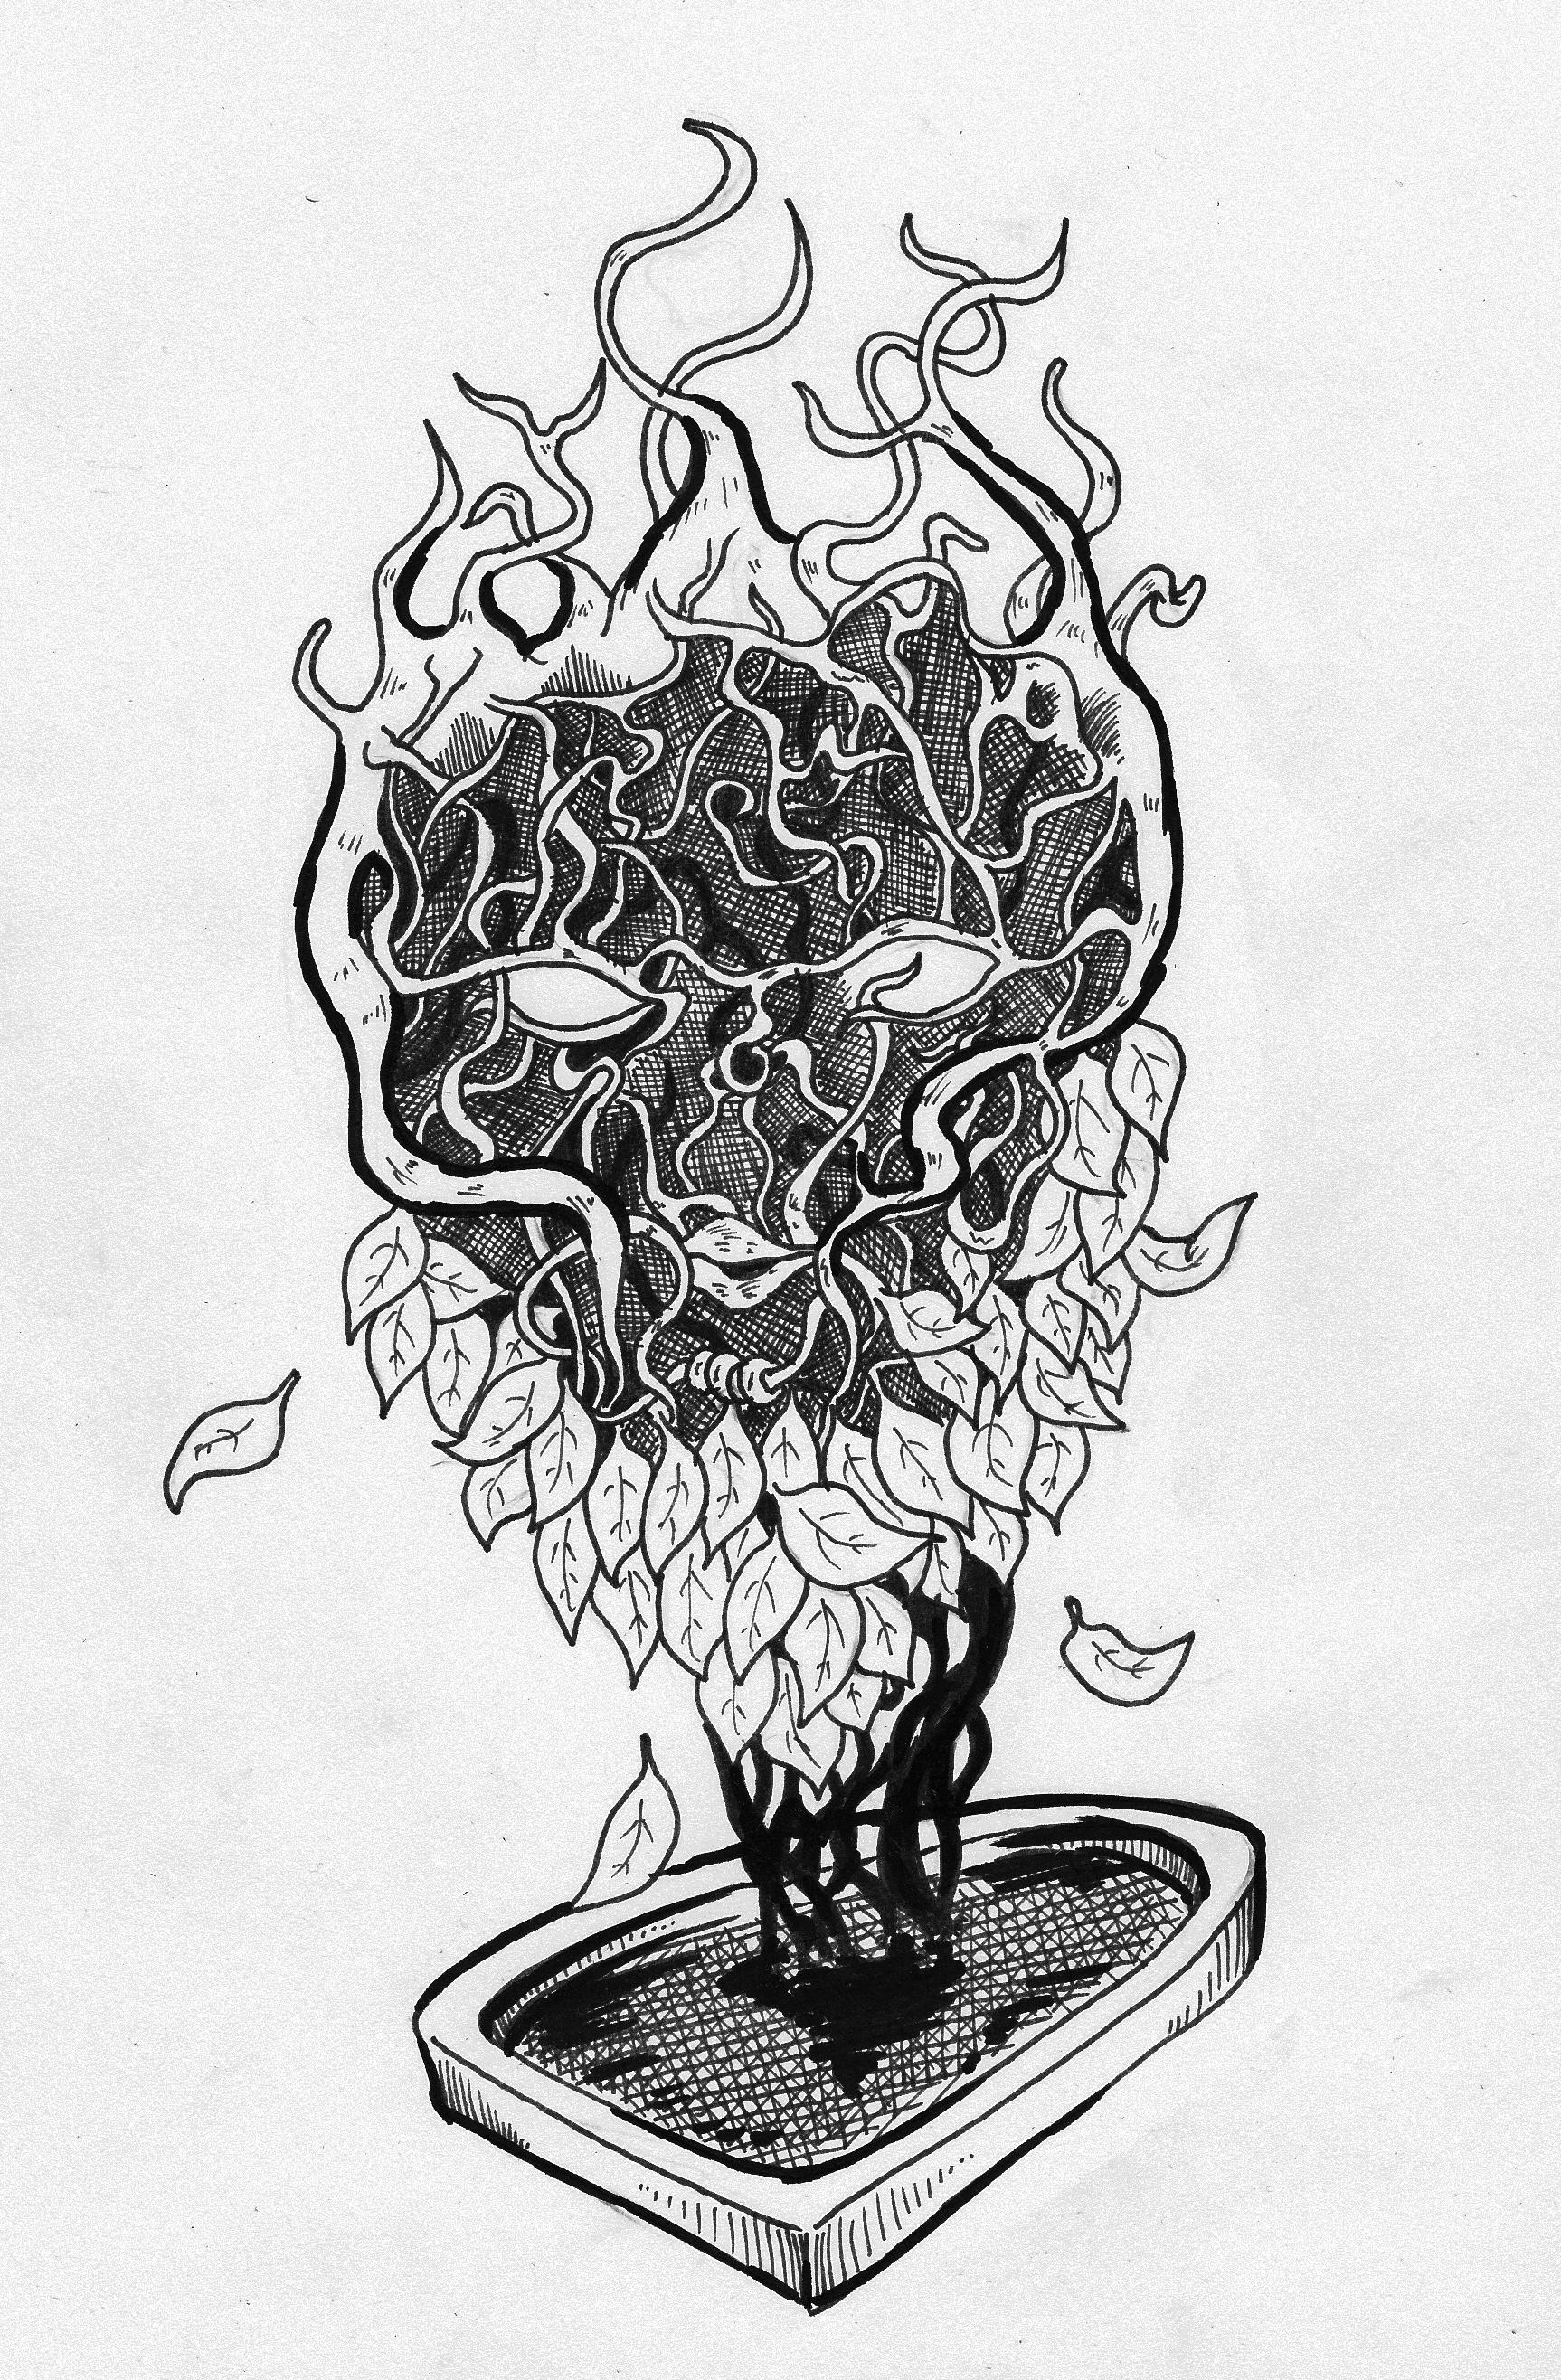 A Doodle A Day - Week 2 - Doodle #5